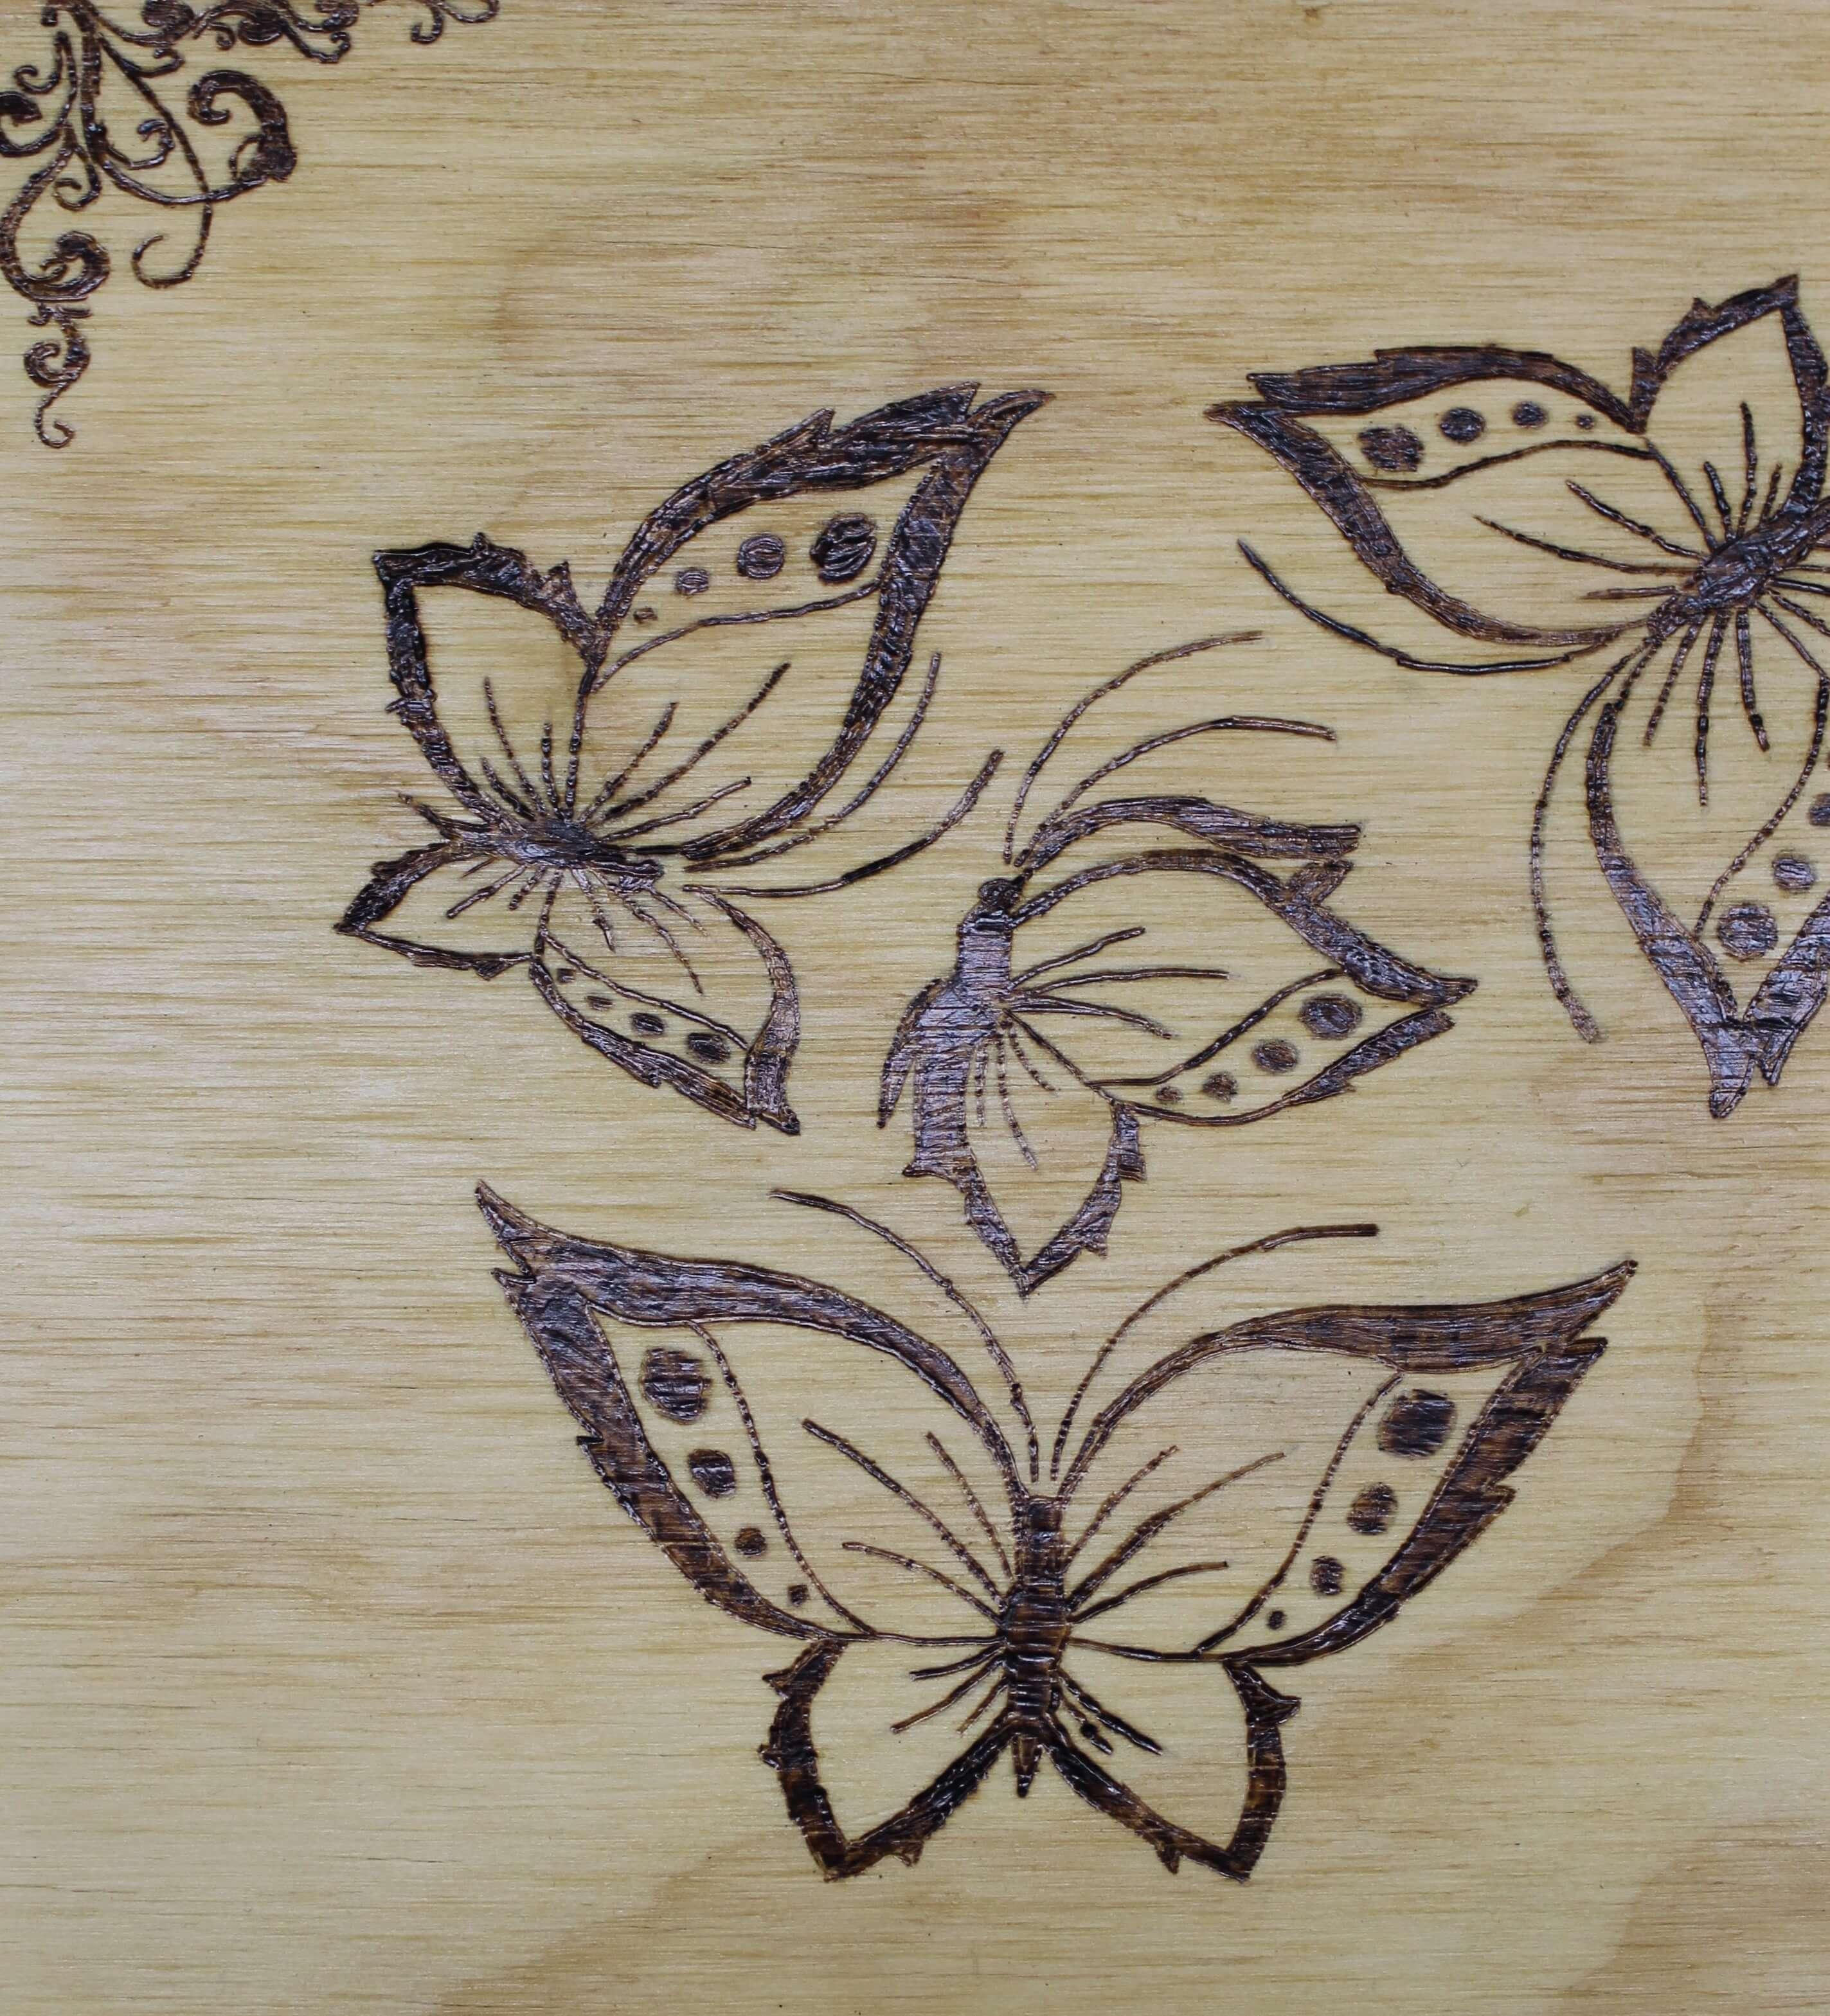 20 Free Printable Wood Burning Patterns For Beginners - Free Printable Wood Burning Patterns